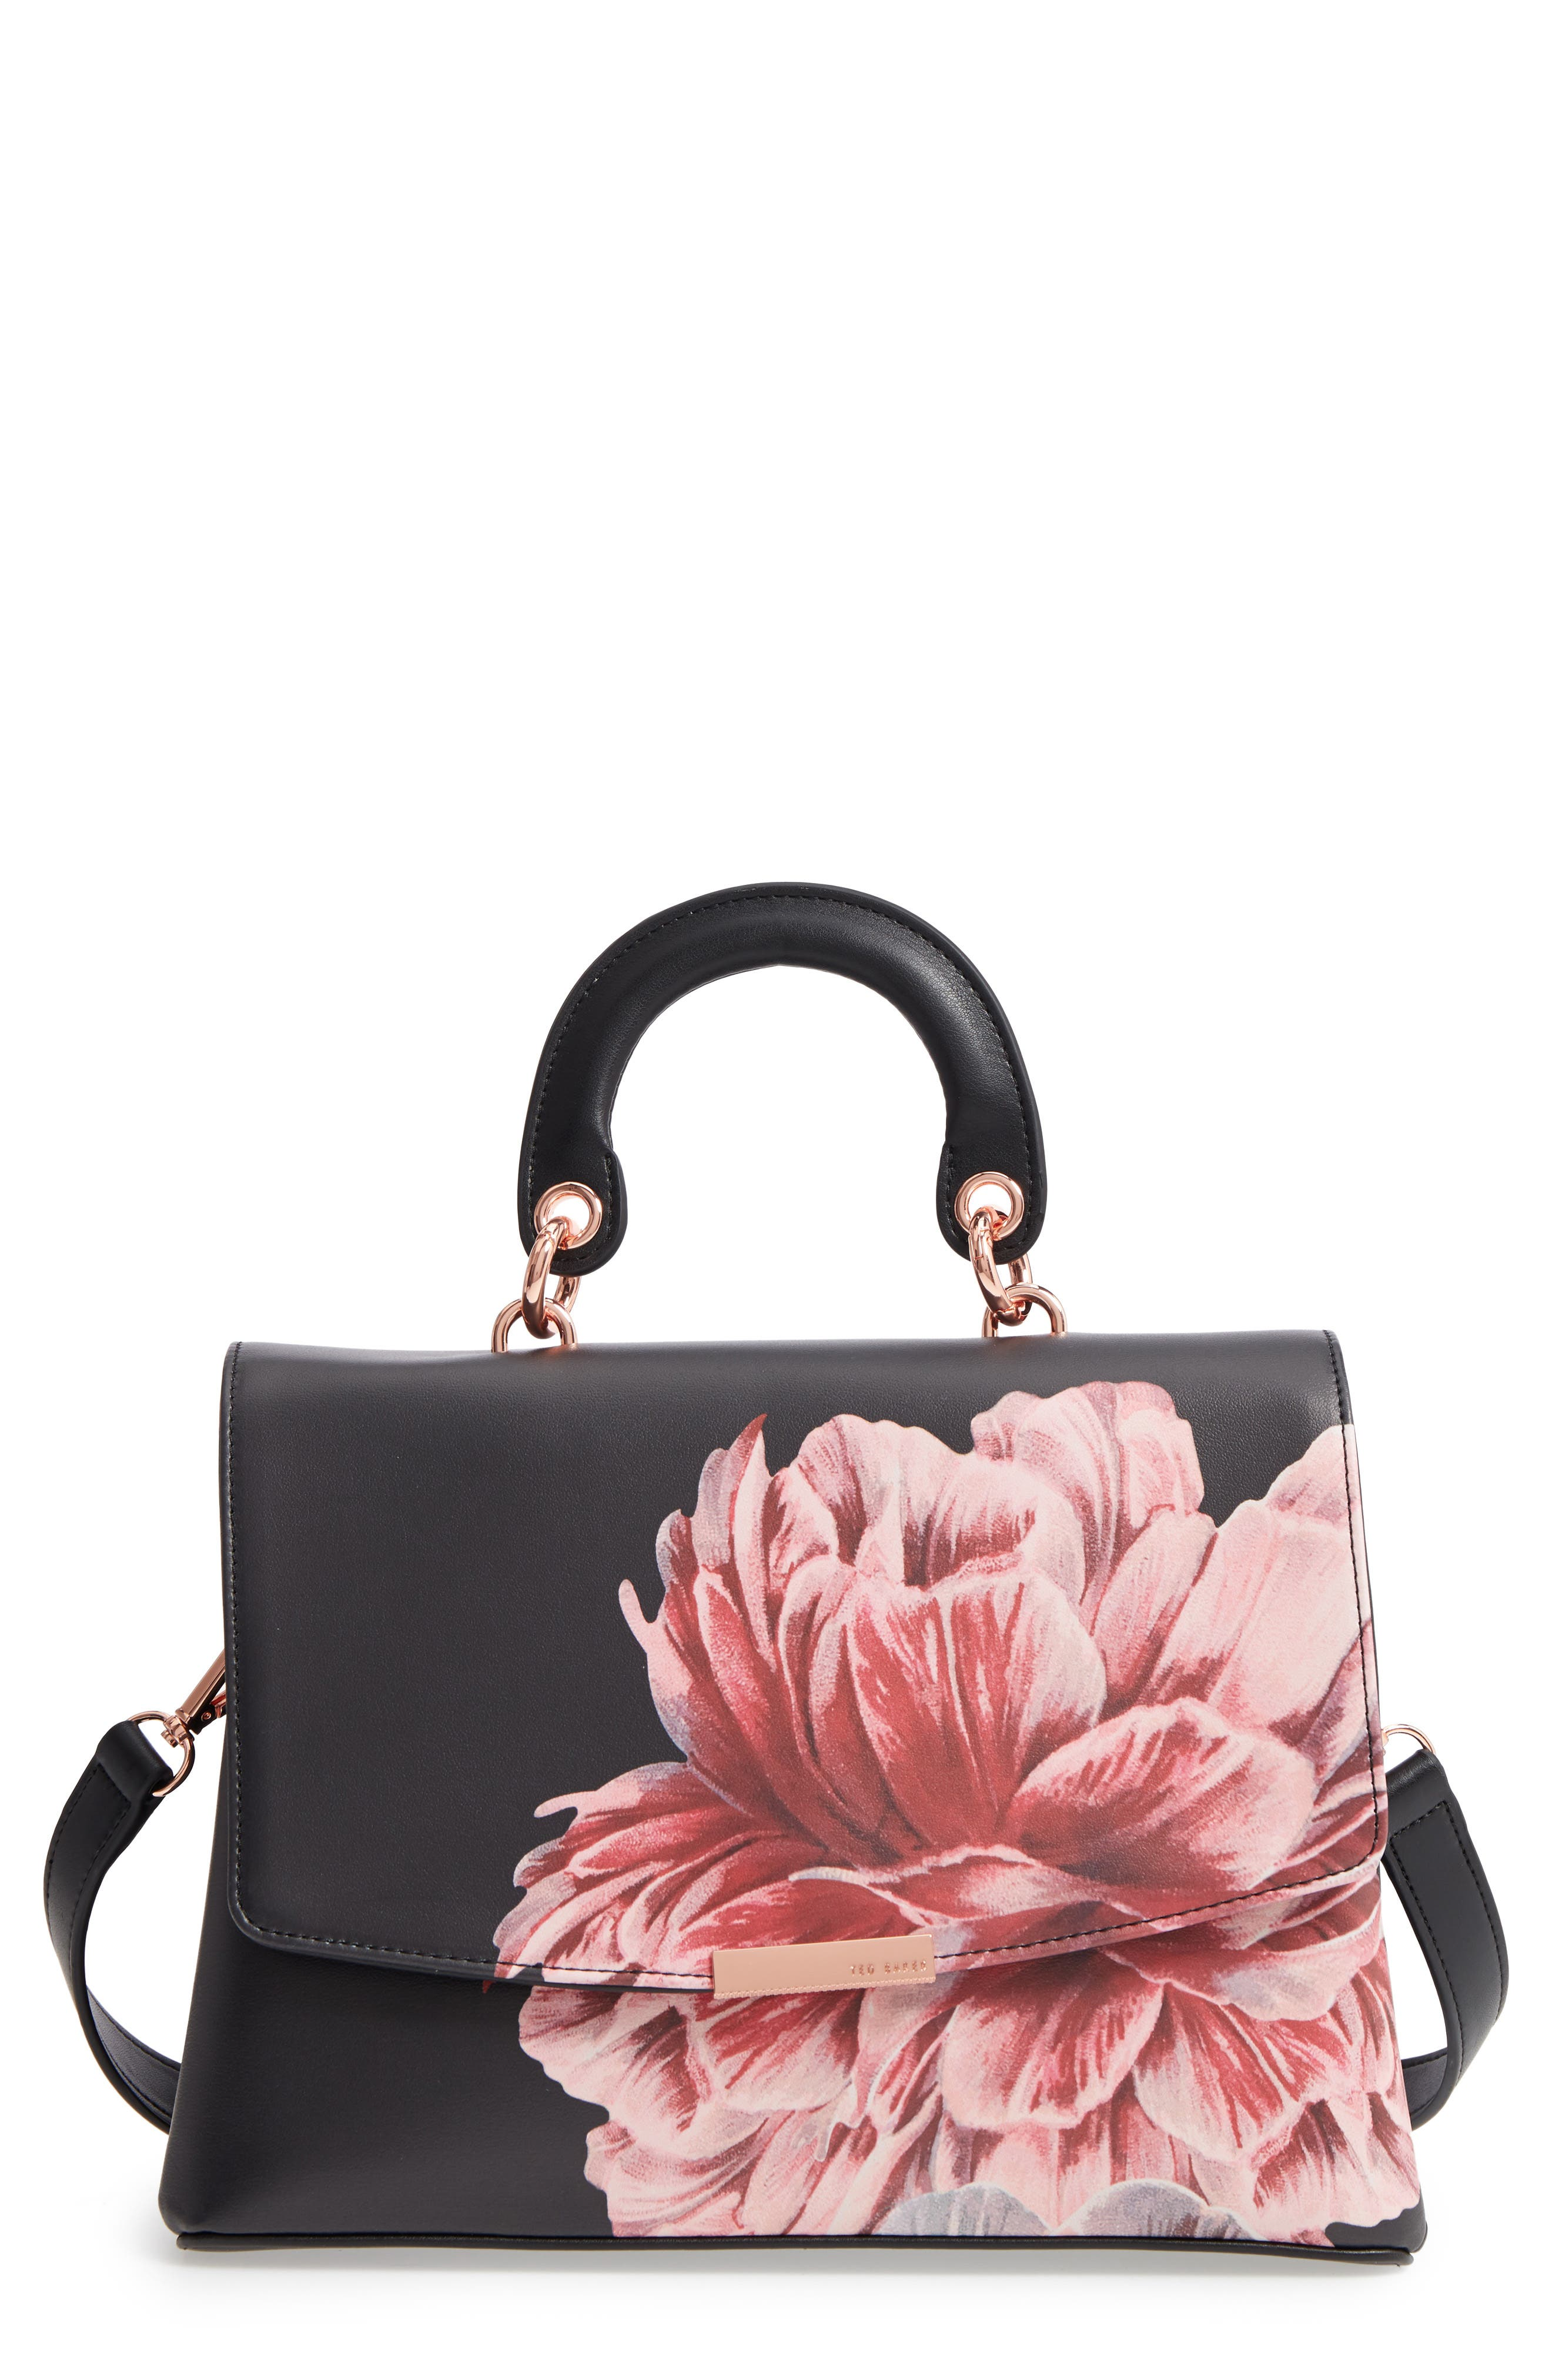 Tranquility Lady Bag Top Handle Satchel,                         Main,                         color, Black